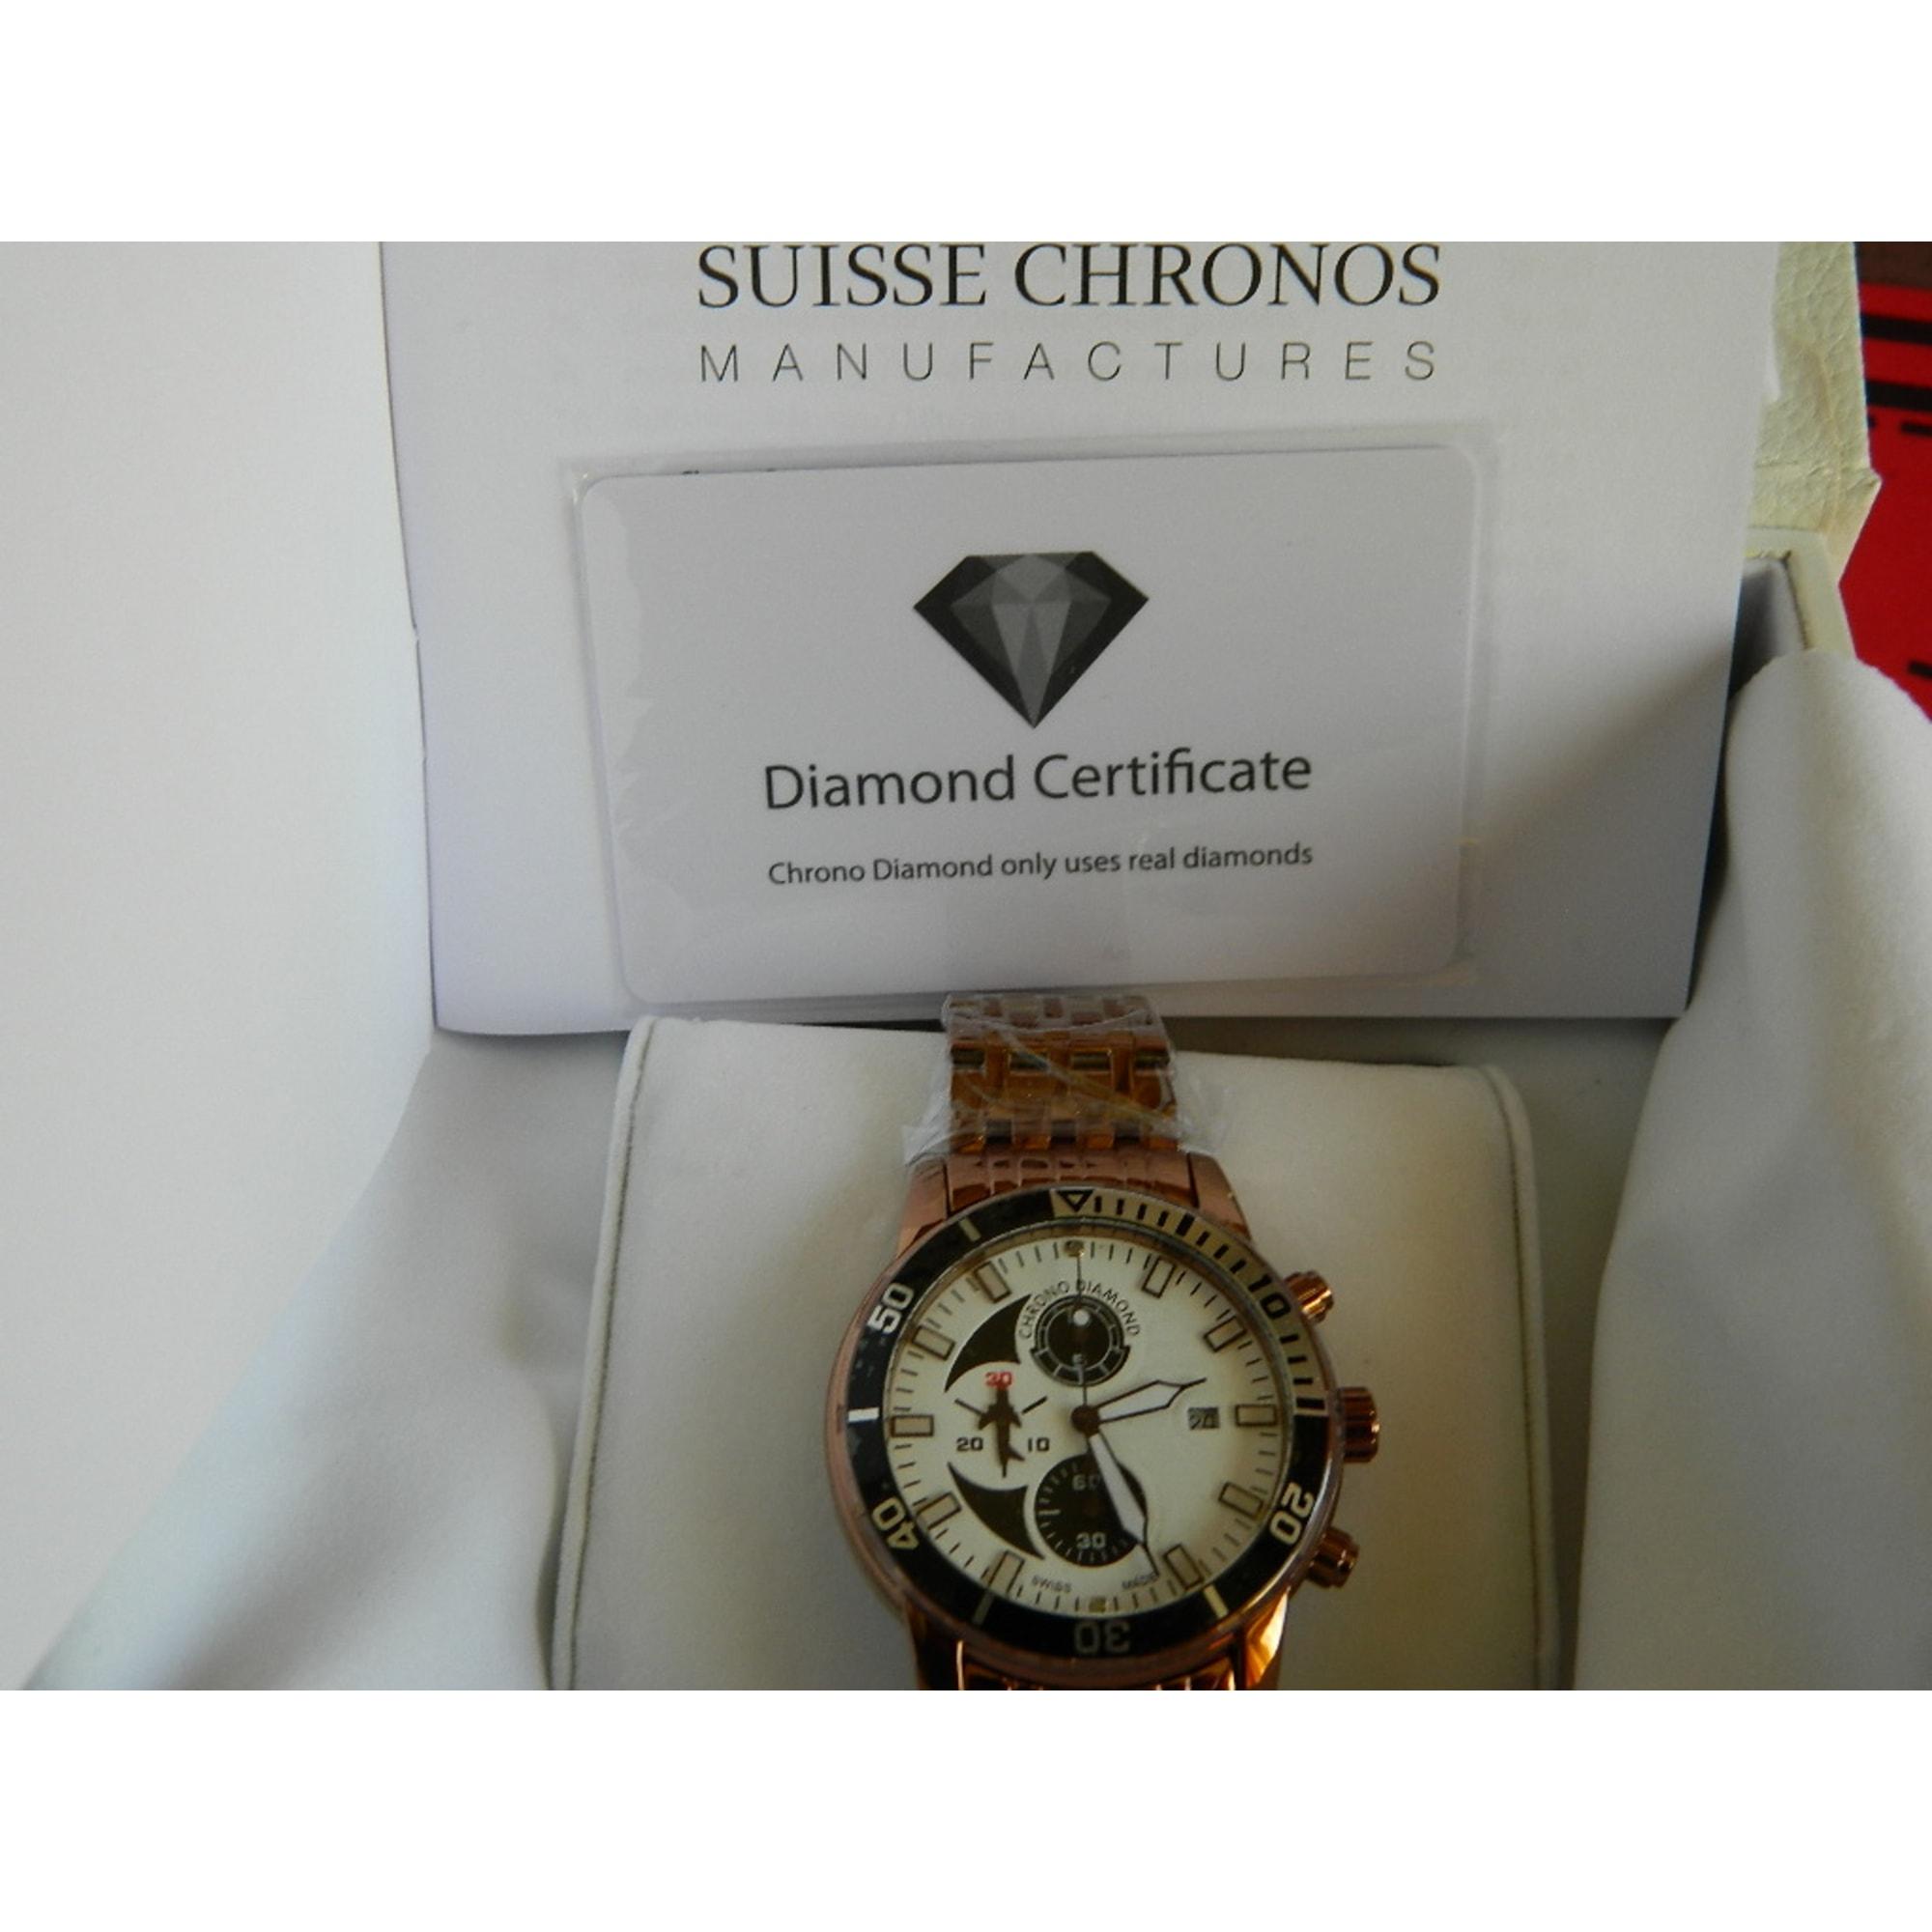 Montre au poignet CHRONO-DIAMOND (SWISS) jaune vendu par ... b9f33a8dde5